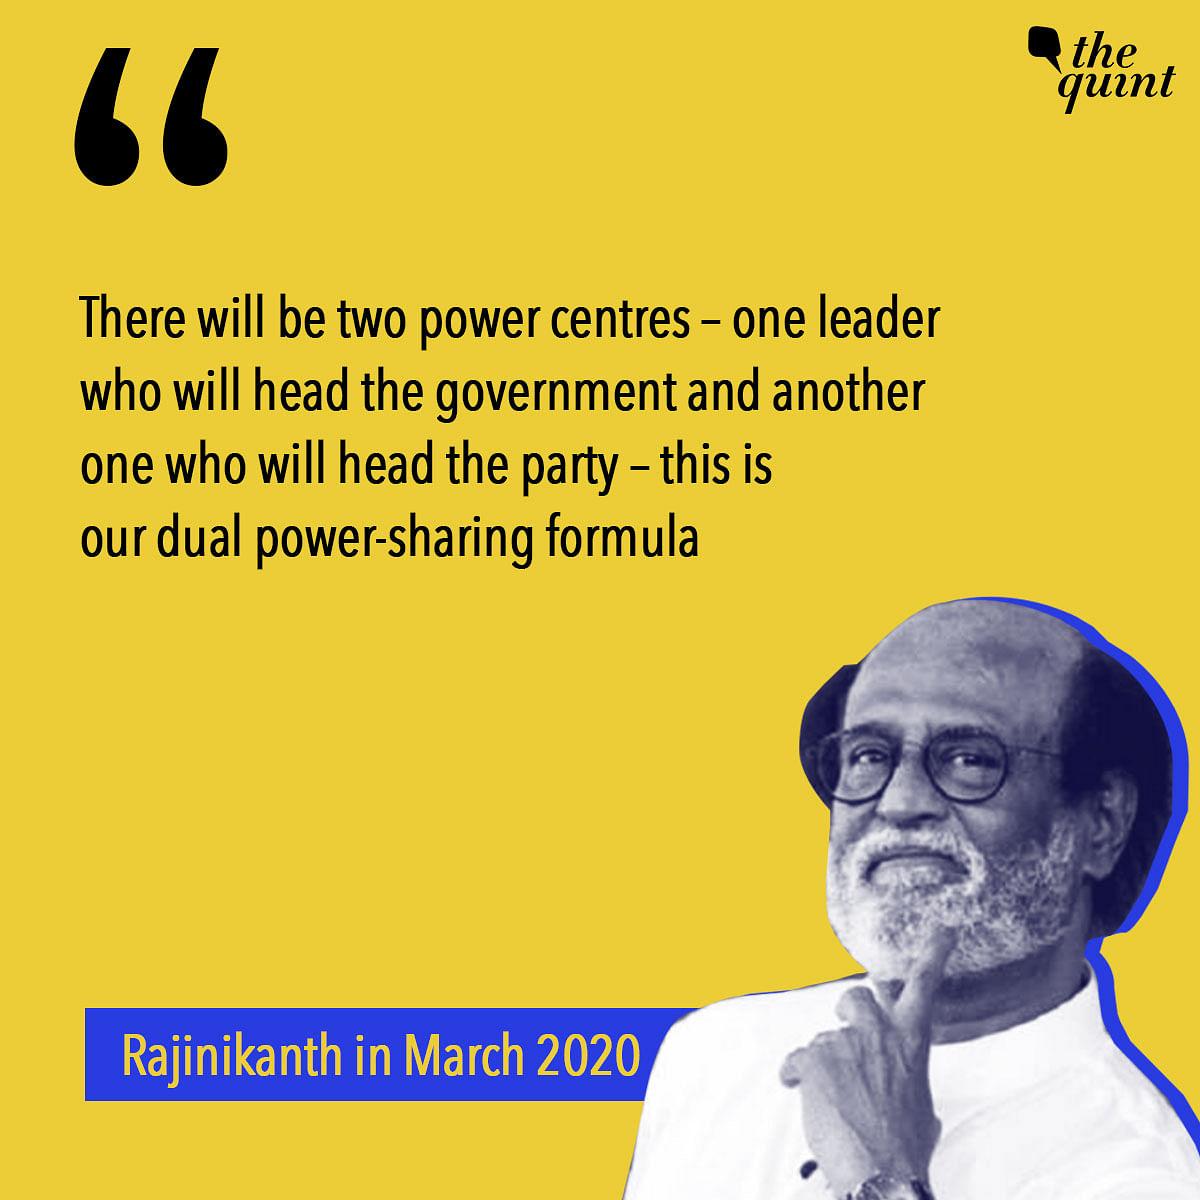 Rajinikanth & Politics: